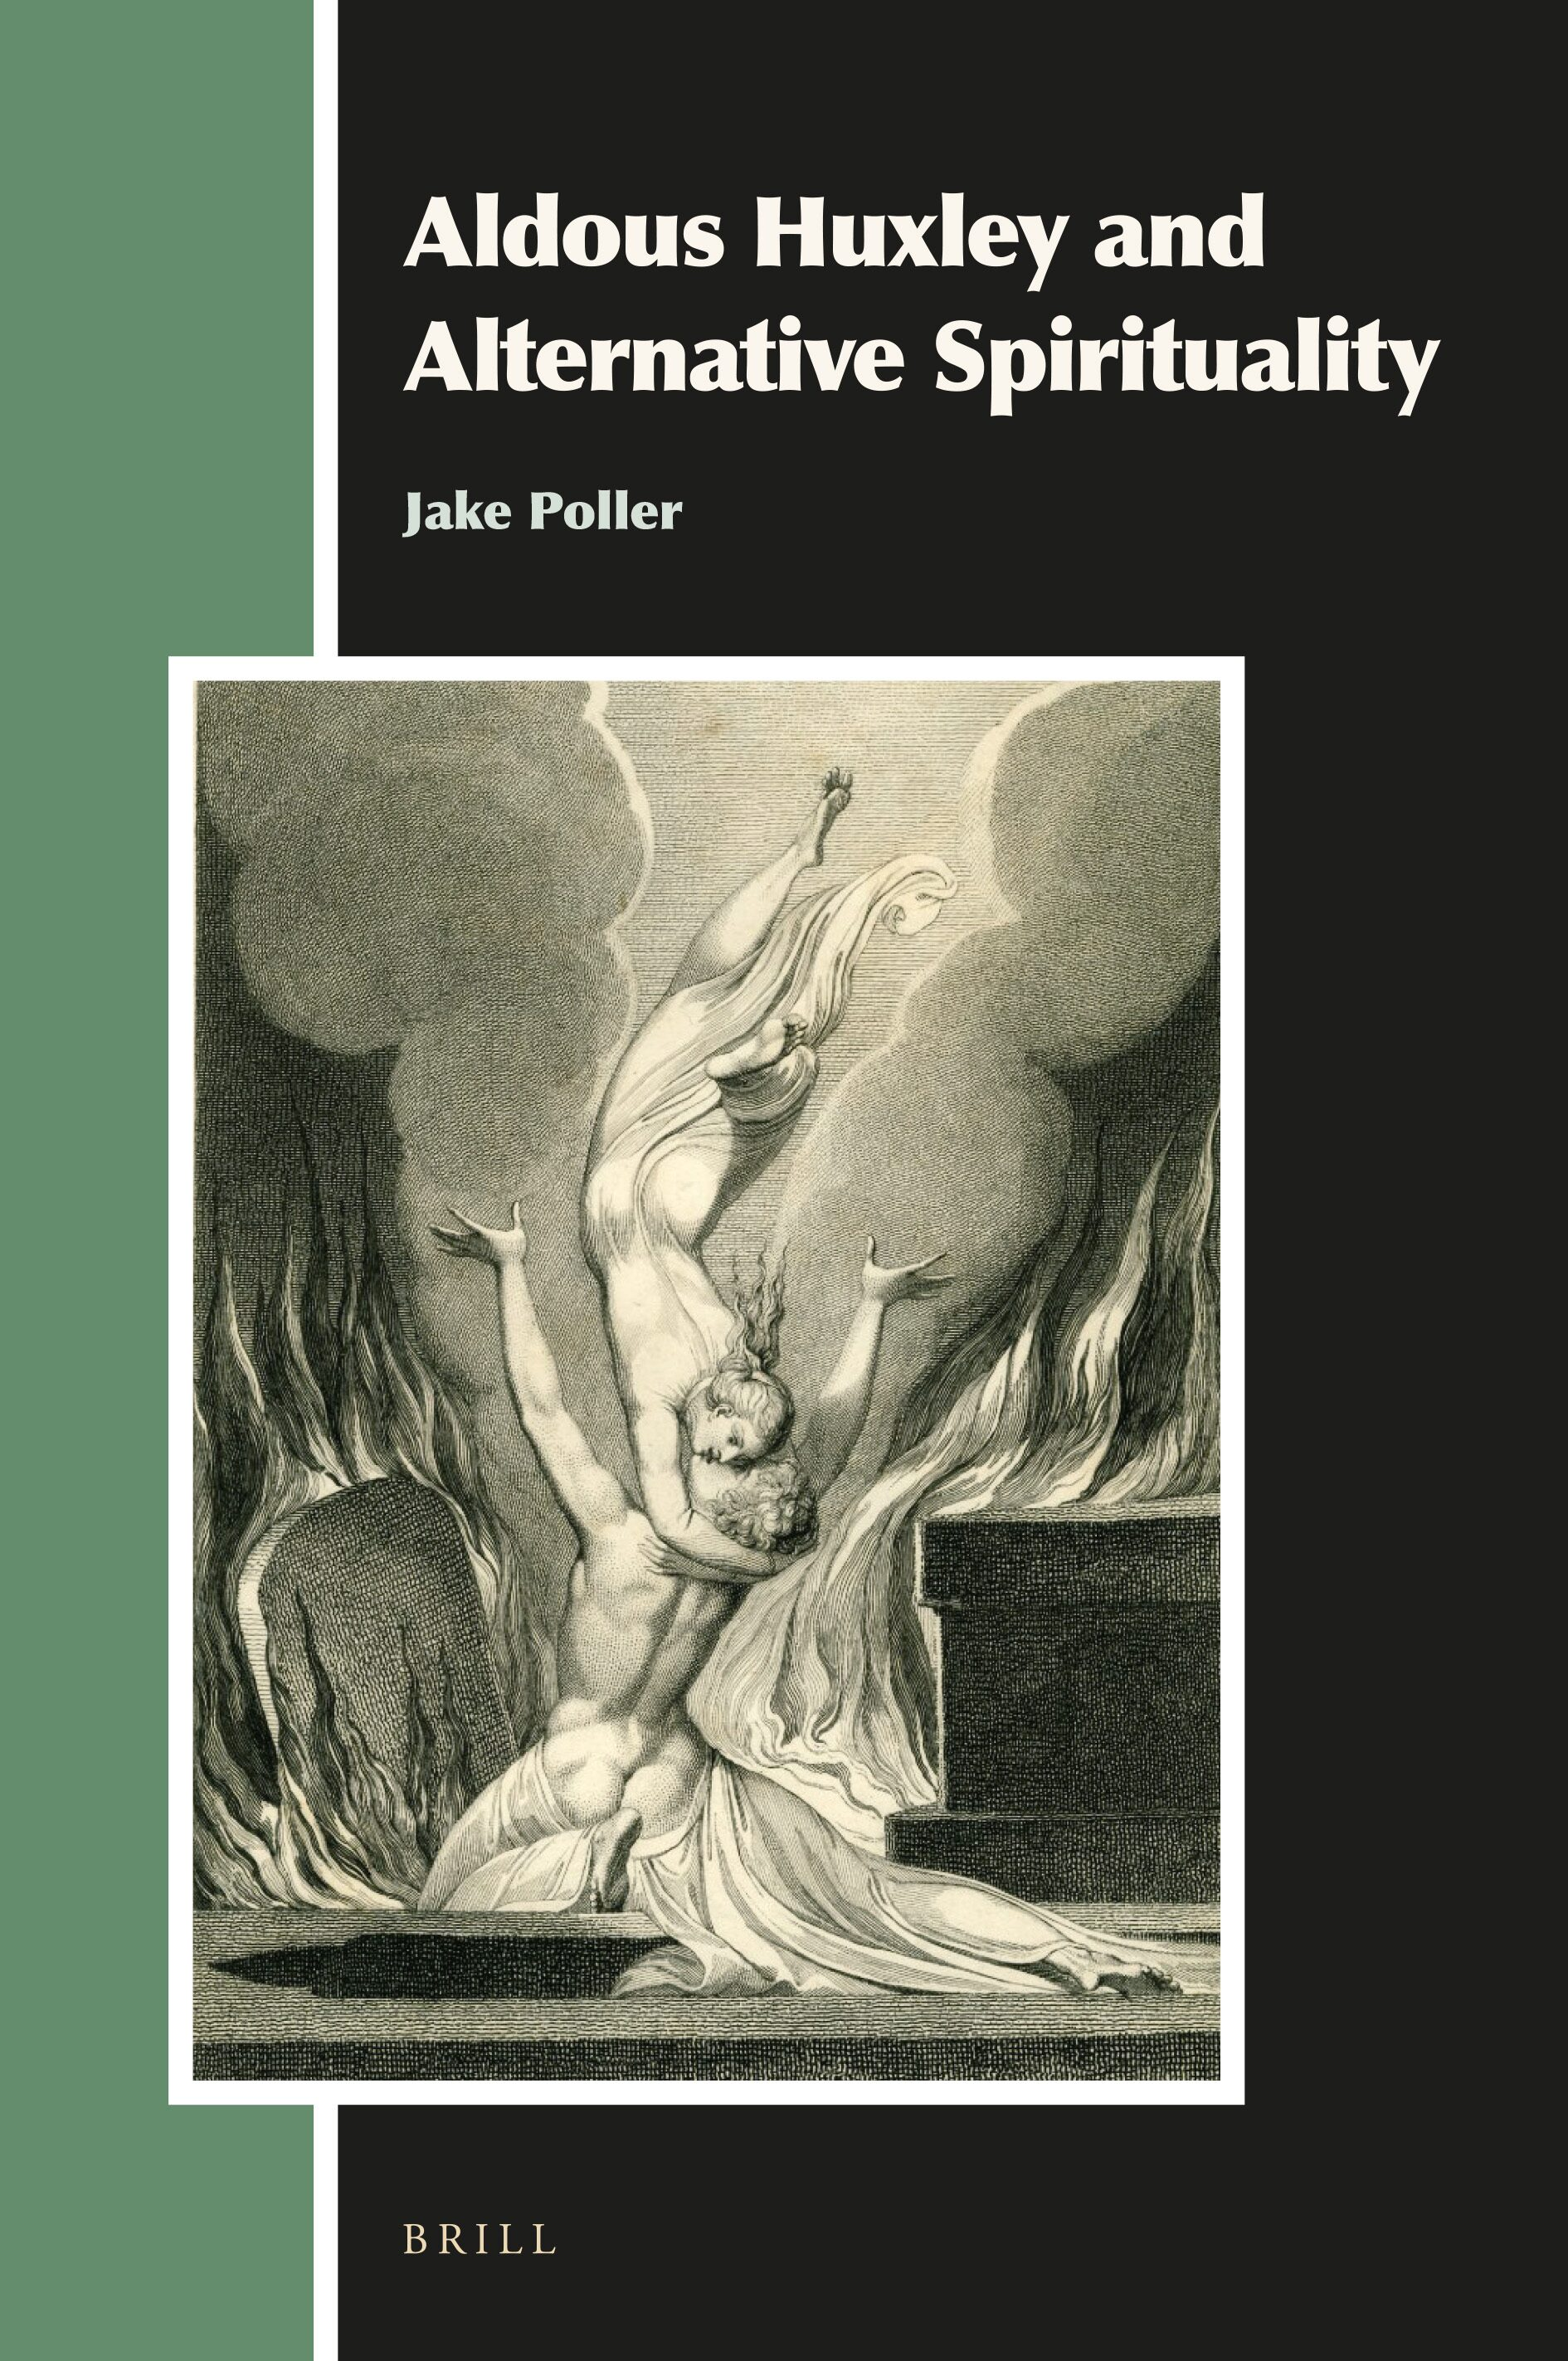 Chapter 1 Aldous Huxley 1894 1963 In Aldous Huxley And Alternative Spirituality